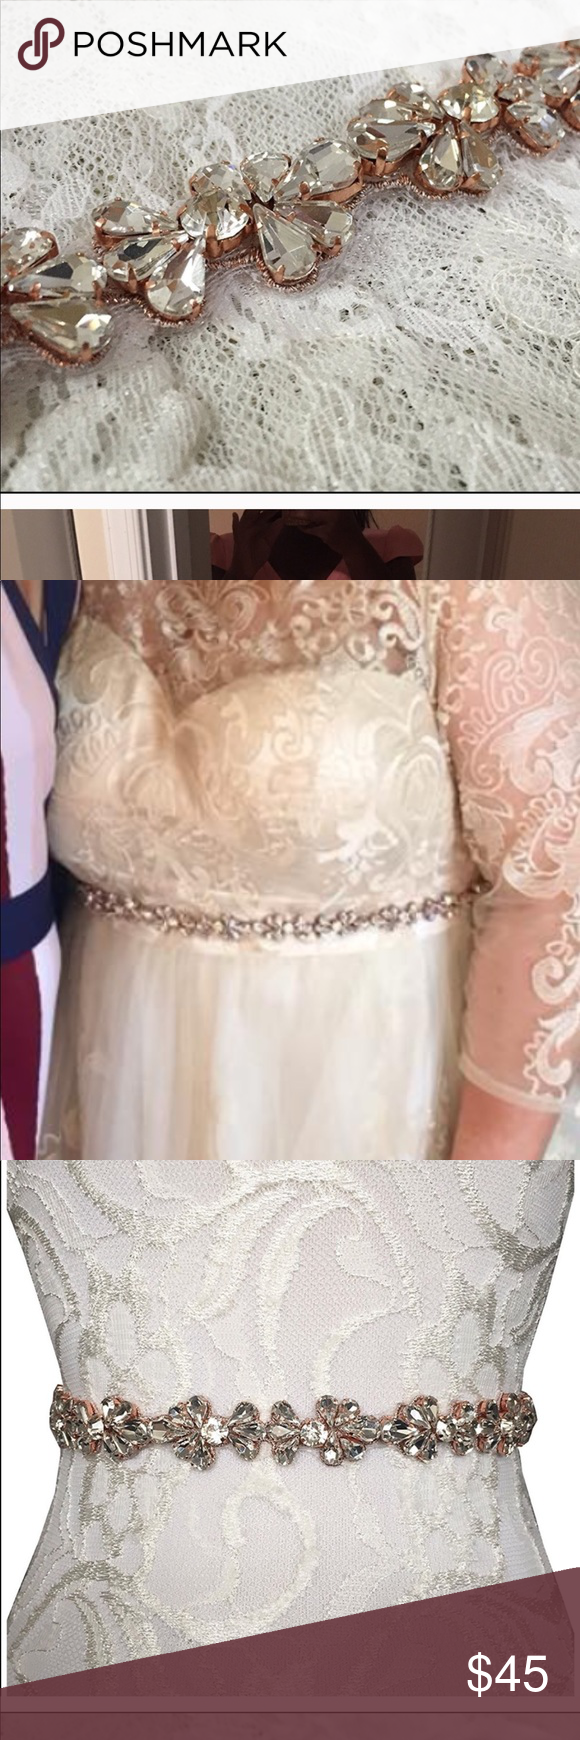 Gold belt for wedding dress  Jeweled beltsash  Jewel Gold and Customer support